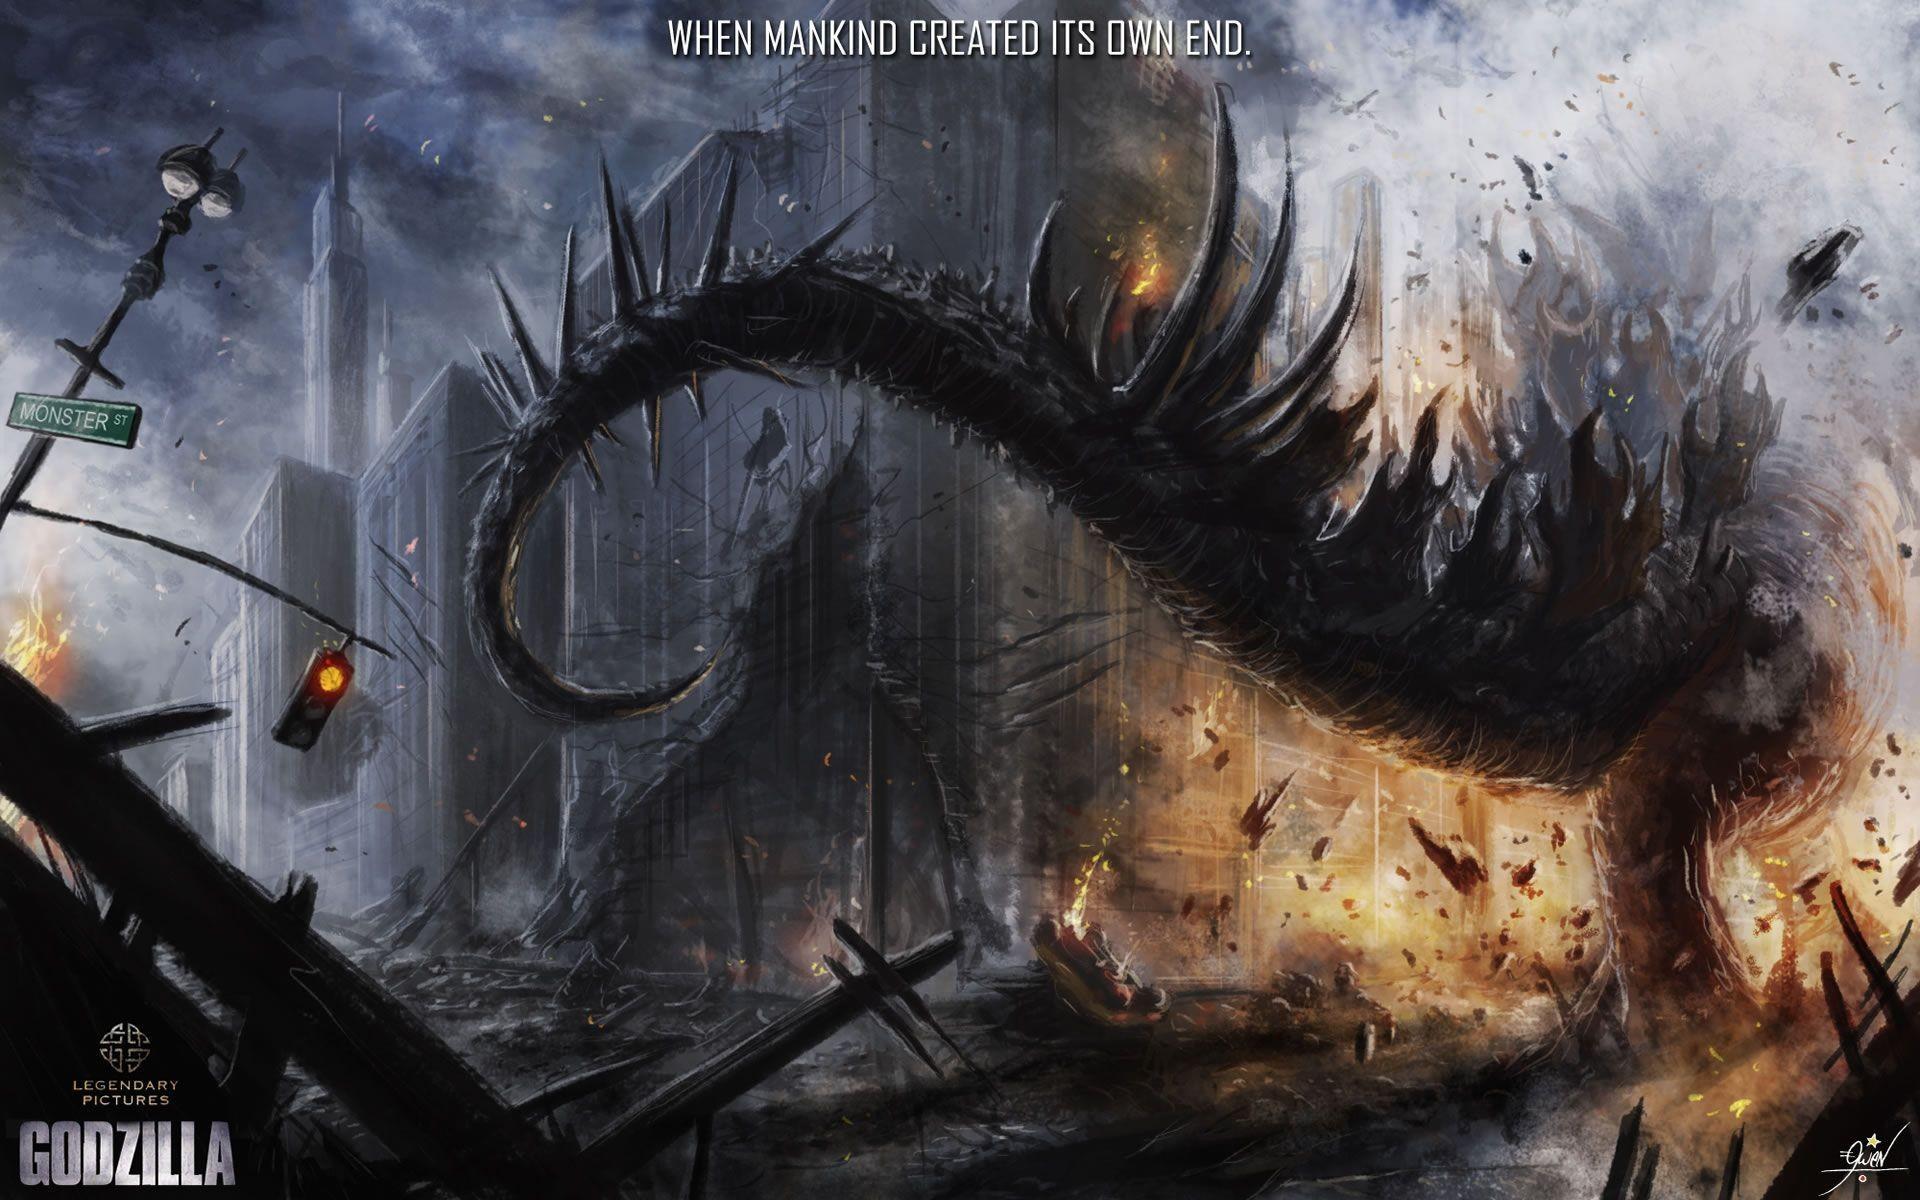 Godzilla HD Wallpaper | Wallpapers | Pinterest | Godzilla and Hd wallpaper